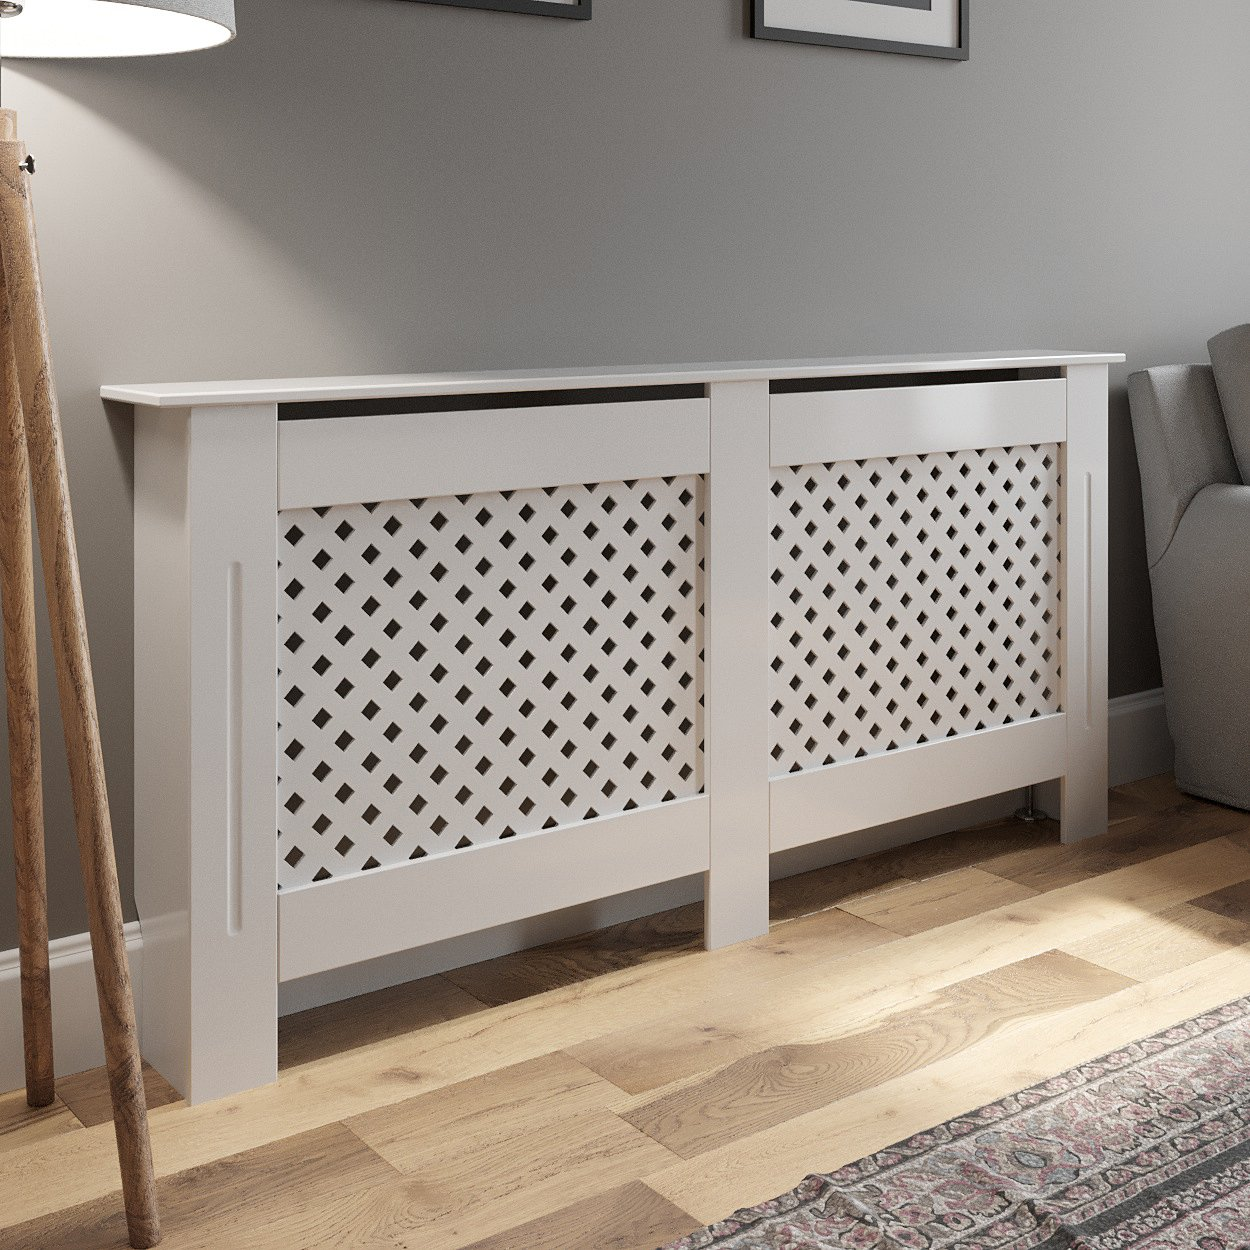 Radiator Cover Wall Cabinet Large Mdf Wood White Diamond Style Modern Furniture 5056093618030 Ebay